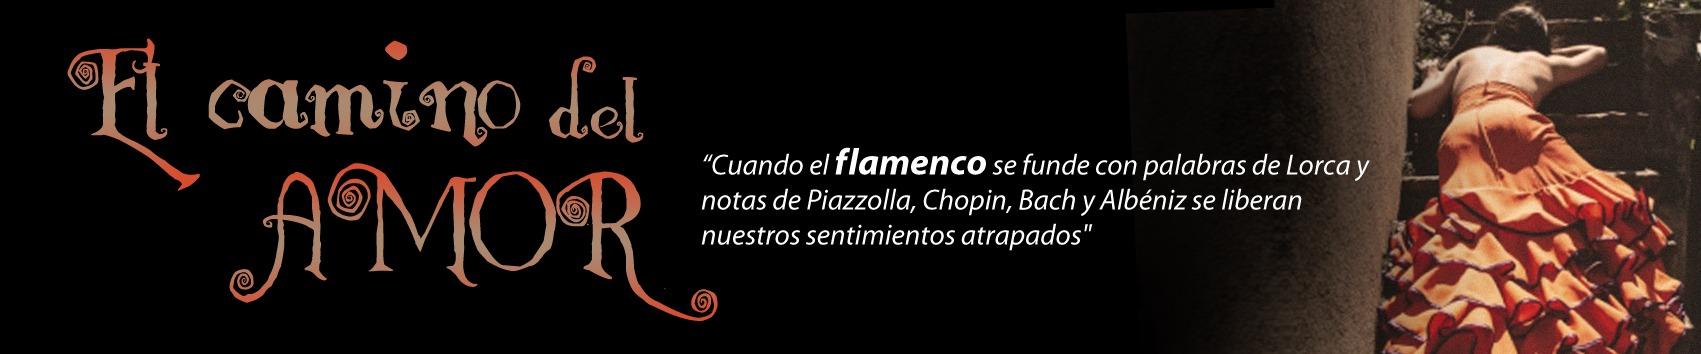 26_BannerCAMINO_AMOR